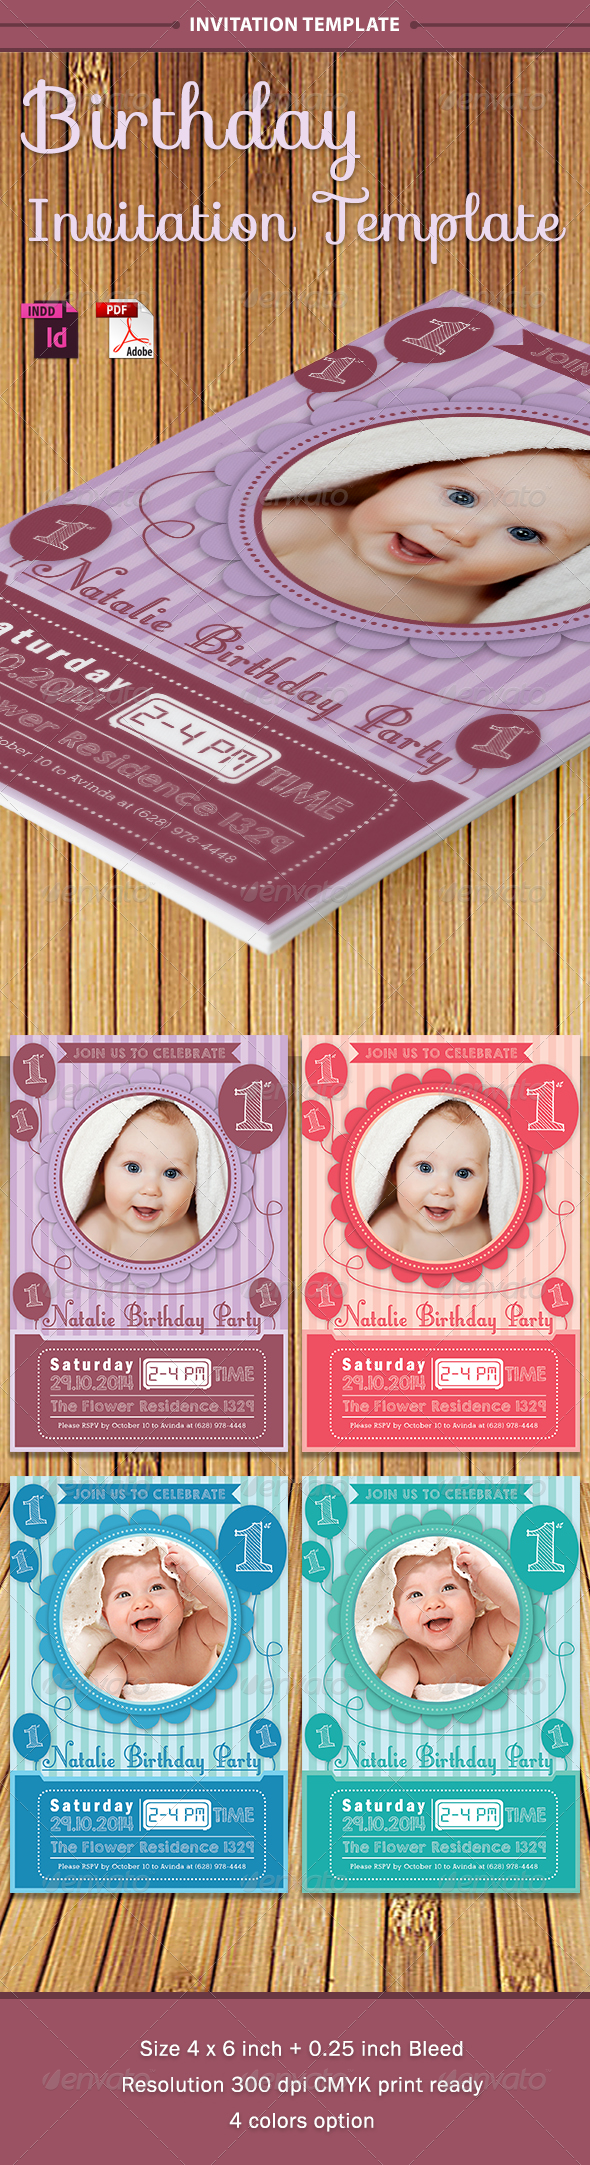 Baby Birthday Template - Vol. 1 - Birthday Greeting Cards